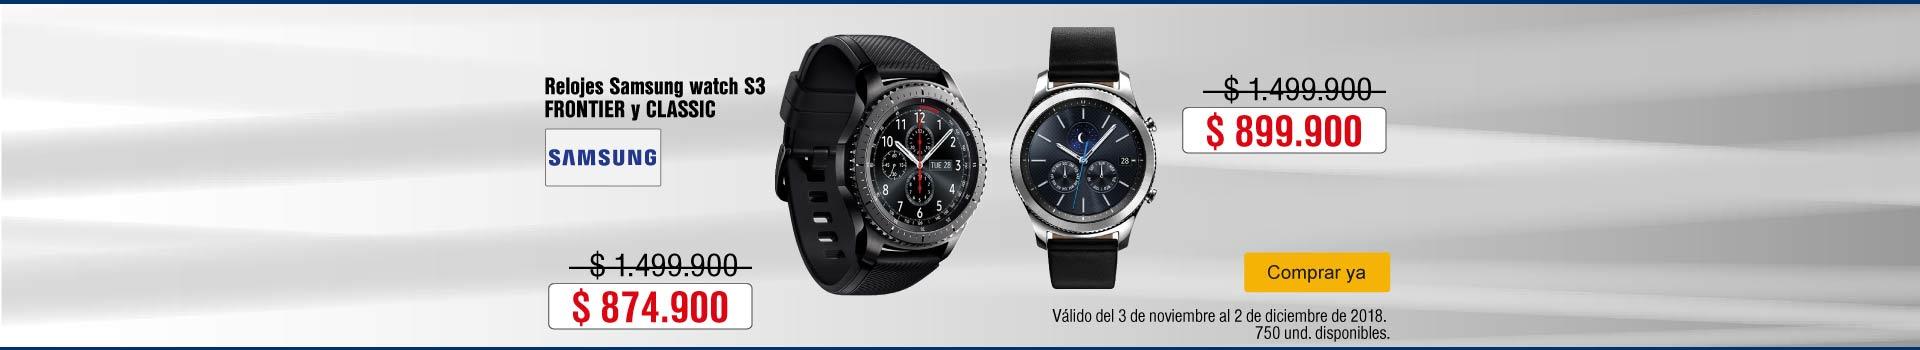 AK-KT-BCAT-15-accesorios-PP---samsung-watch-s3-7nov